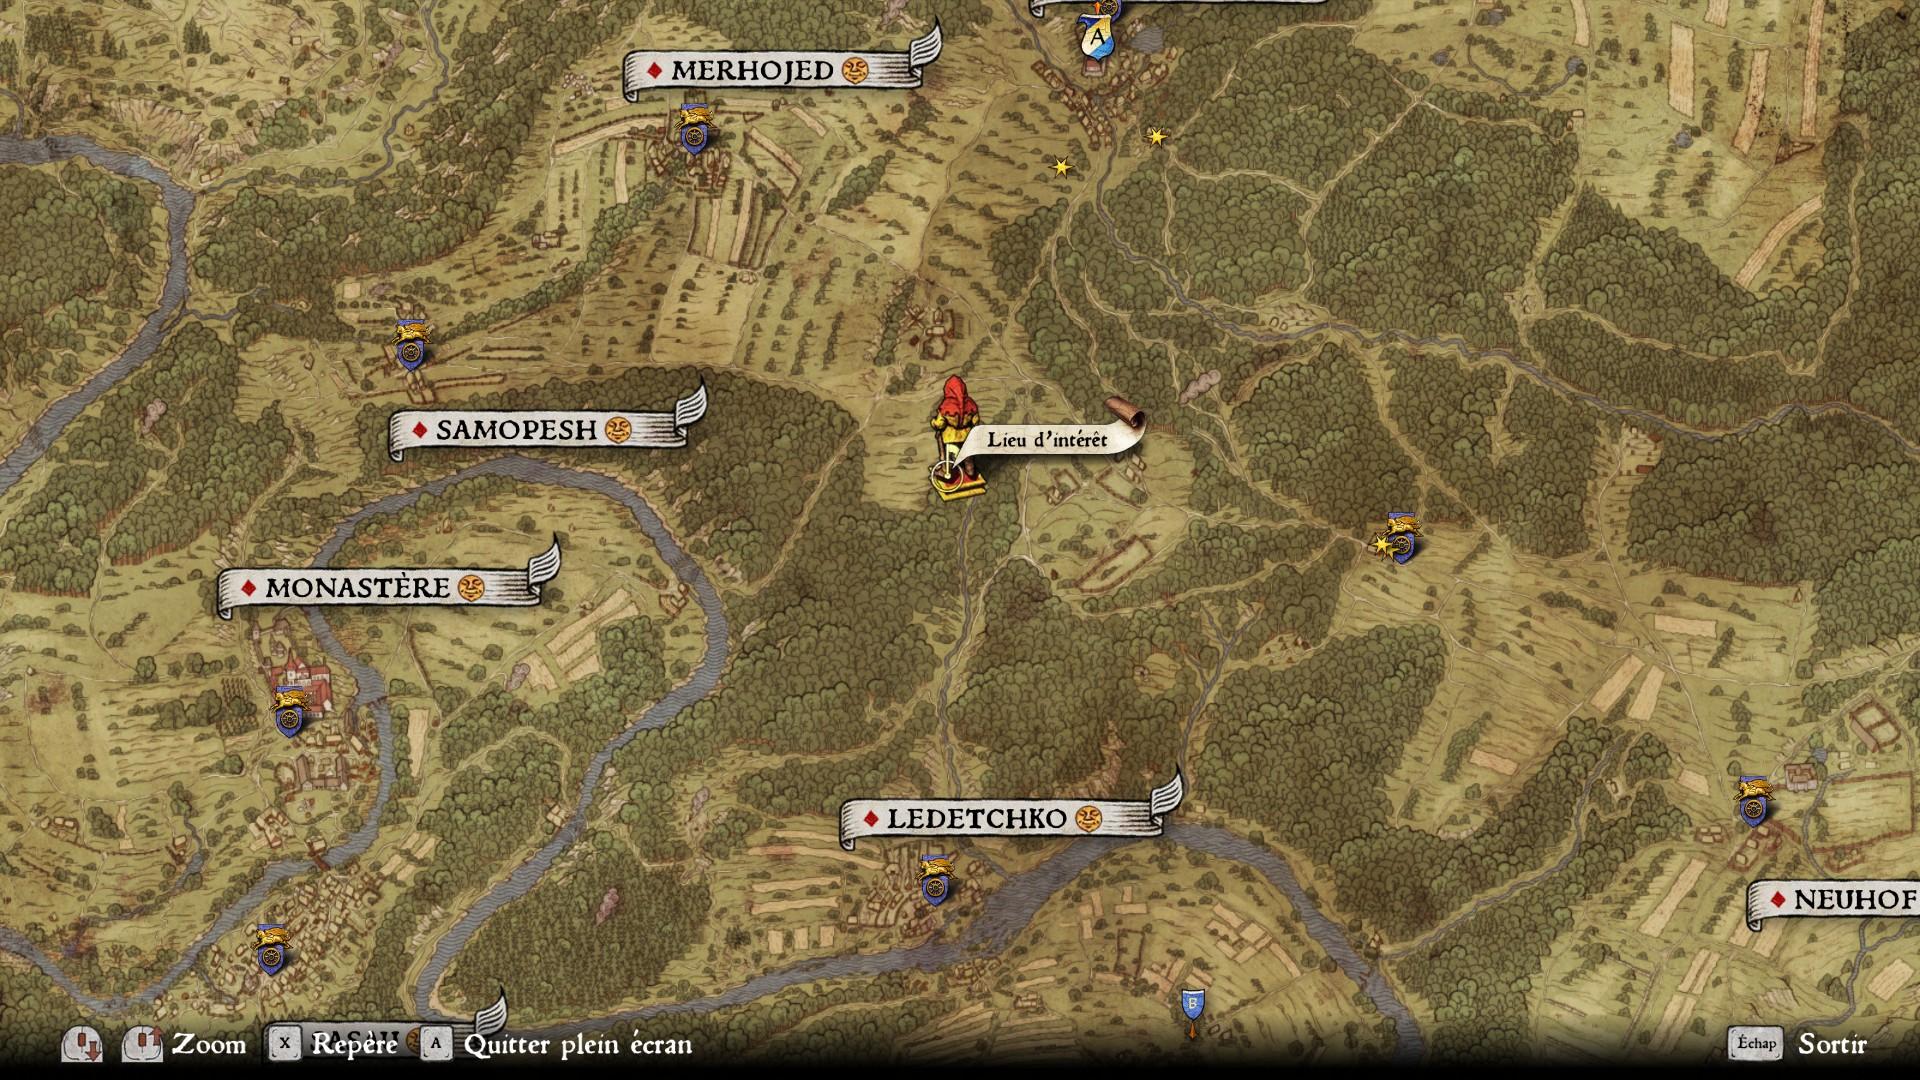 Carte Au Tresor Xviii.Steam Community Guide Tous Les Tresors Ancestraux Et